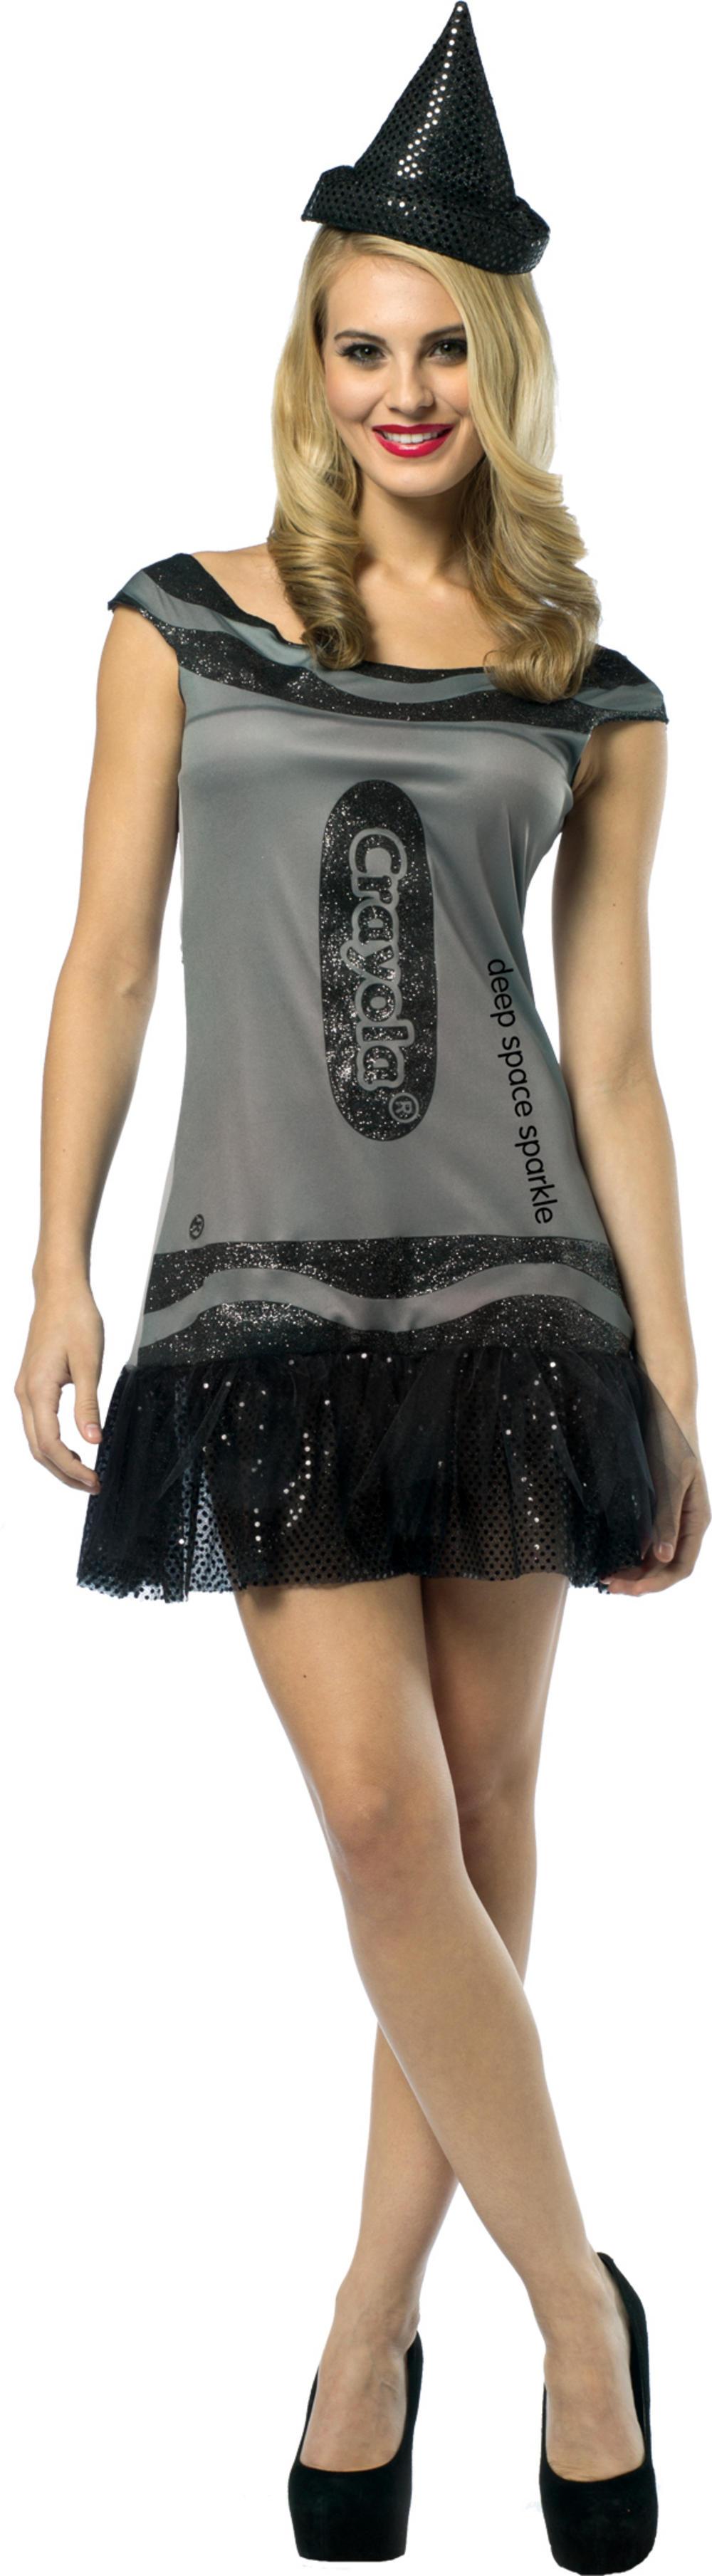 Black Sparkle Crayola Glitter Dress Ladies Costume